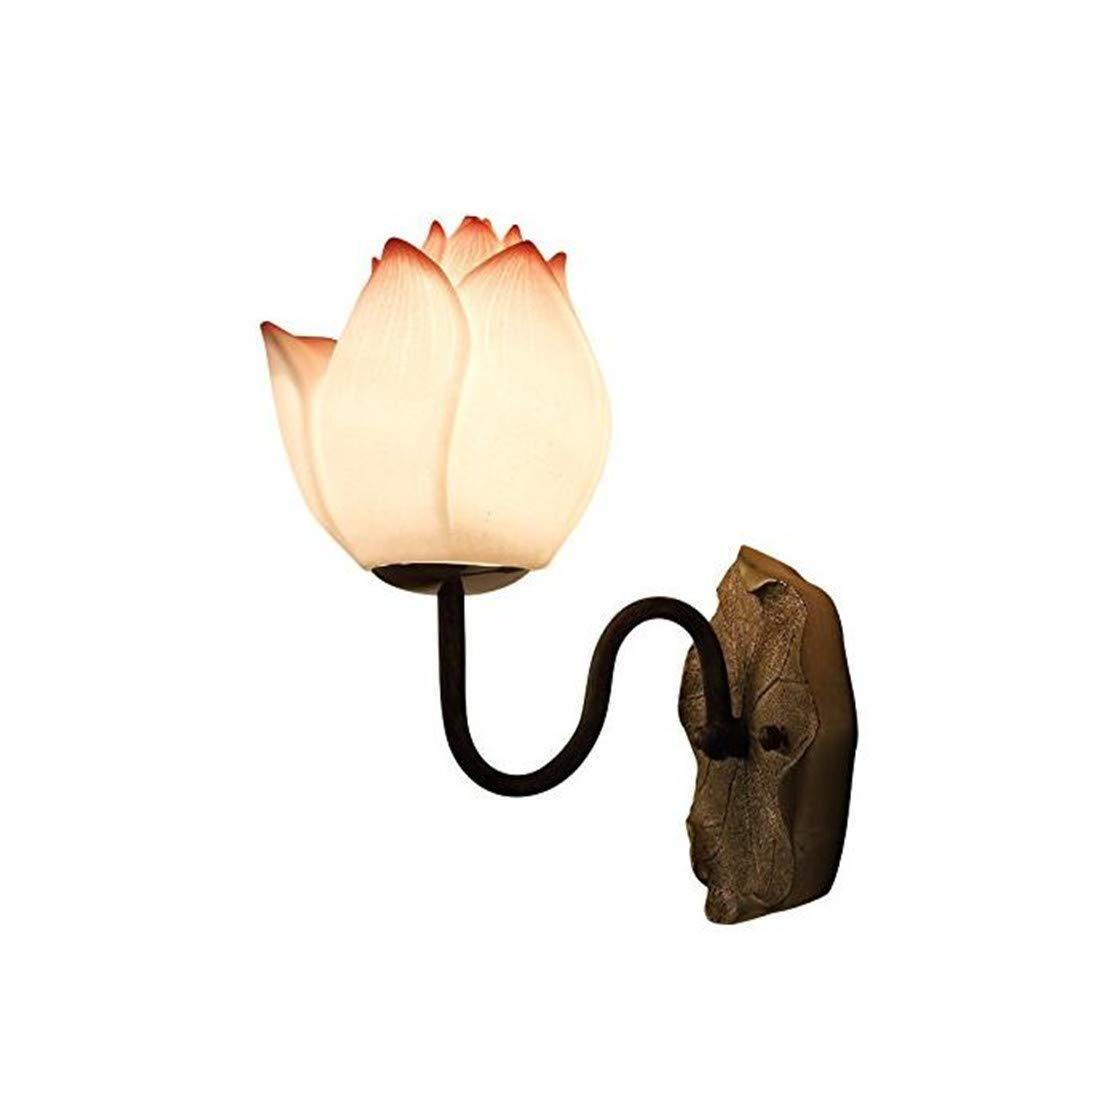 Vintage Chandelier Chinese Antique Lotus Laterne Wandlampe Nachttischlampe Treppen Wandleuchten Hotel Gang Hj8881 Lin Pollenfarbe + Freie Lichtquelle, Lin Pollenfarbe + Freie Lichtquelle